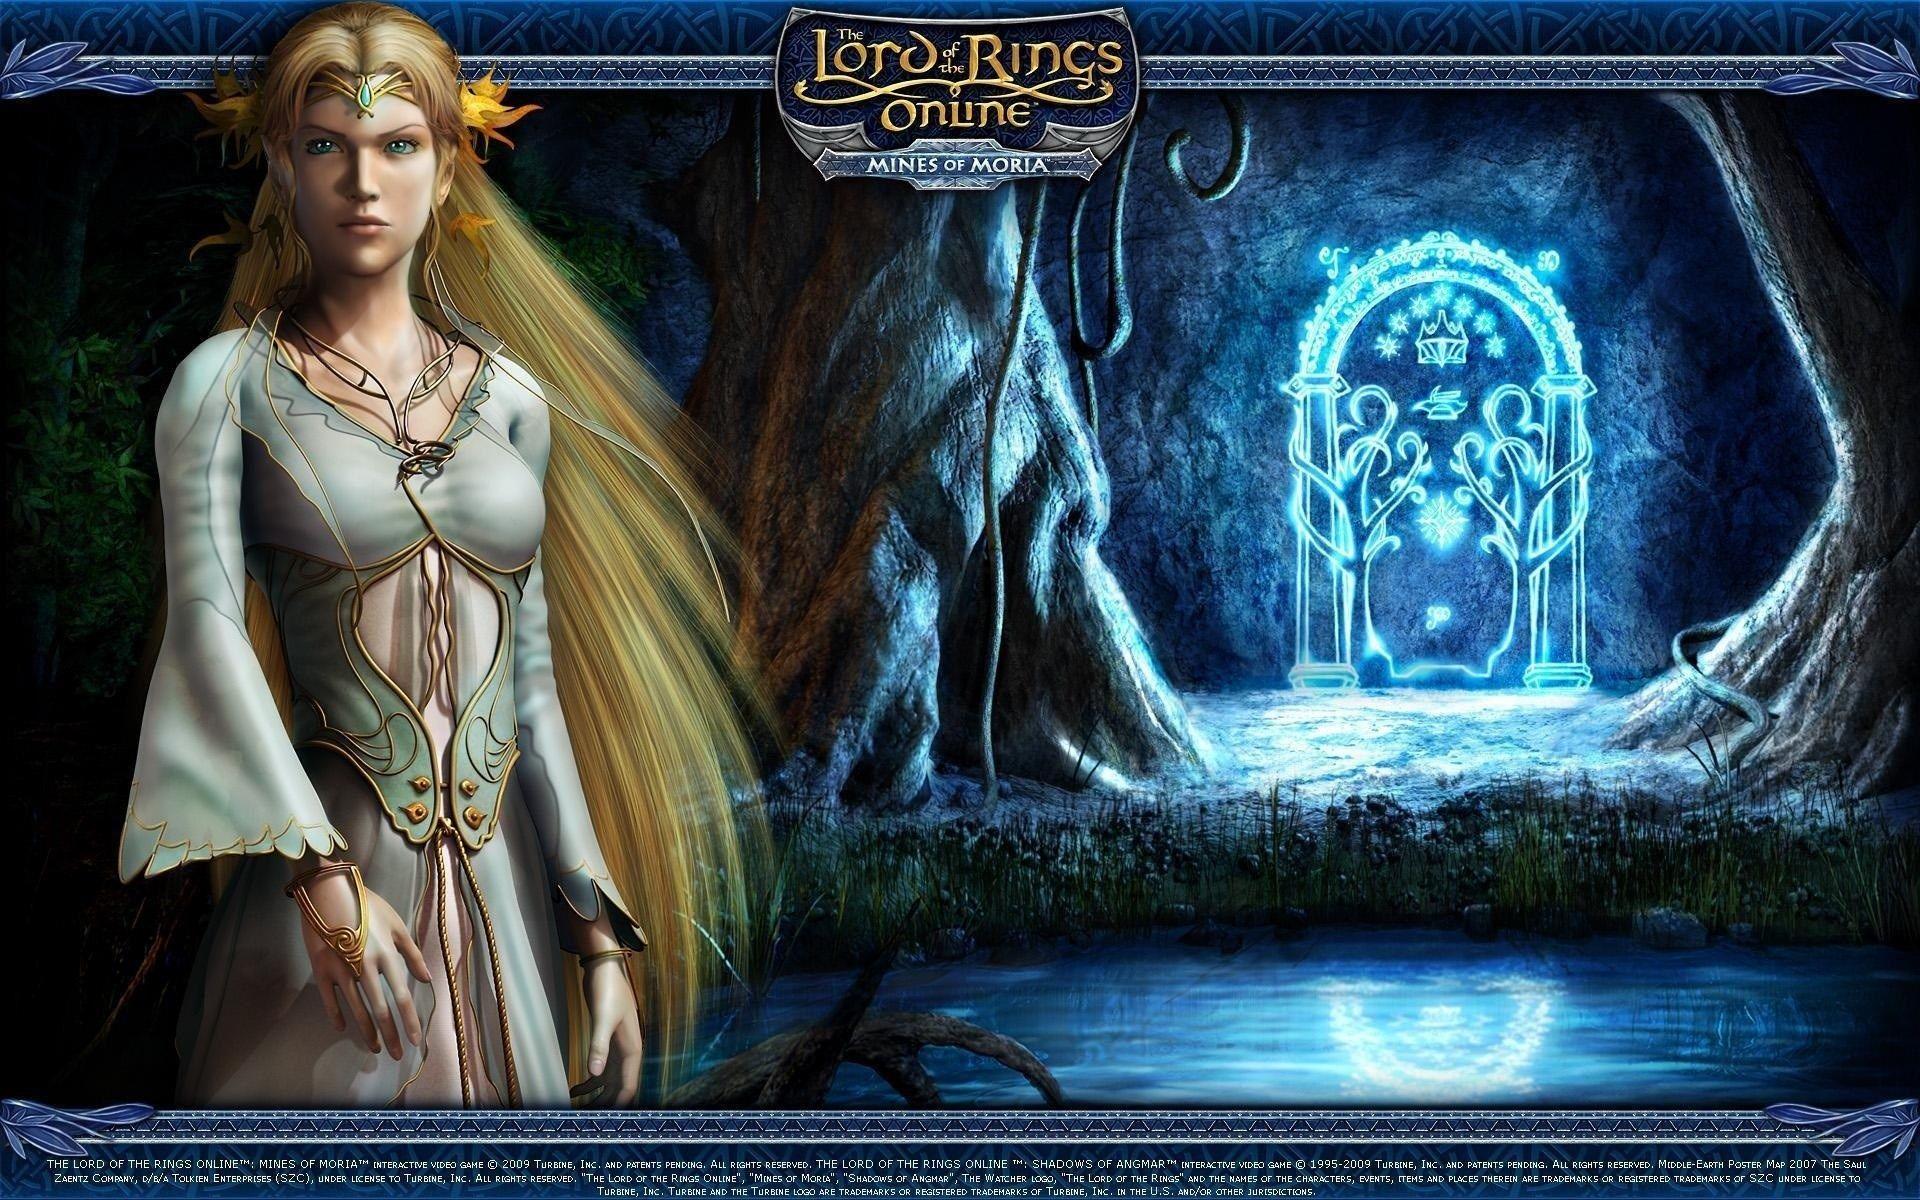 Free Desktop Wallpaper Downloads The Lord Of The Rings Online By Angelica Nail 2017 03 24 El Senor De Los Anillos Senor Admirable